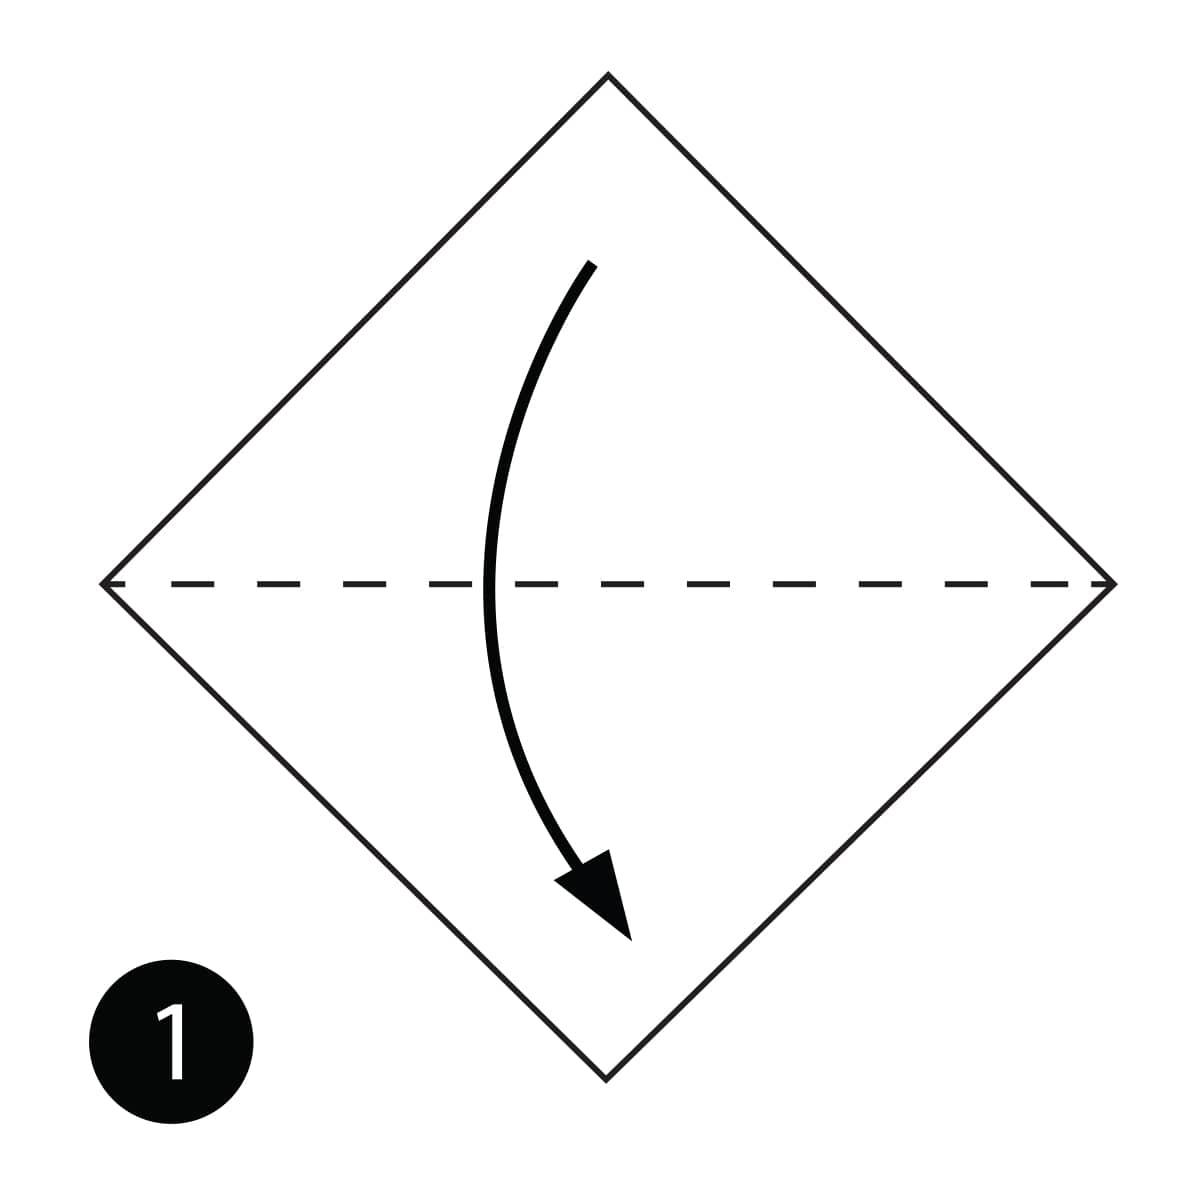 Contact us at Origami-Instructions.com | 1200x1200